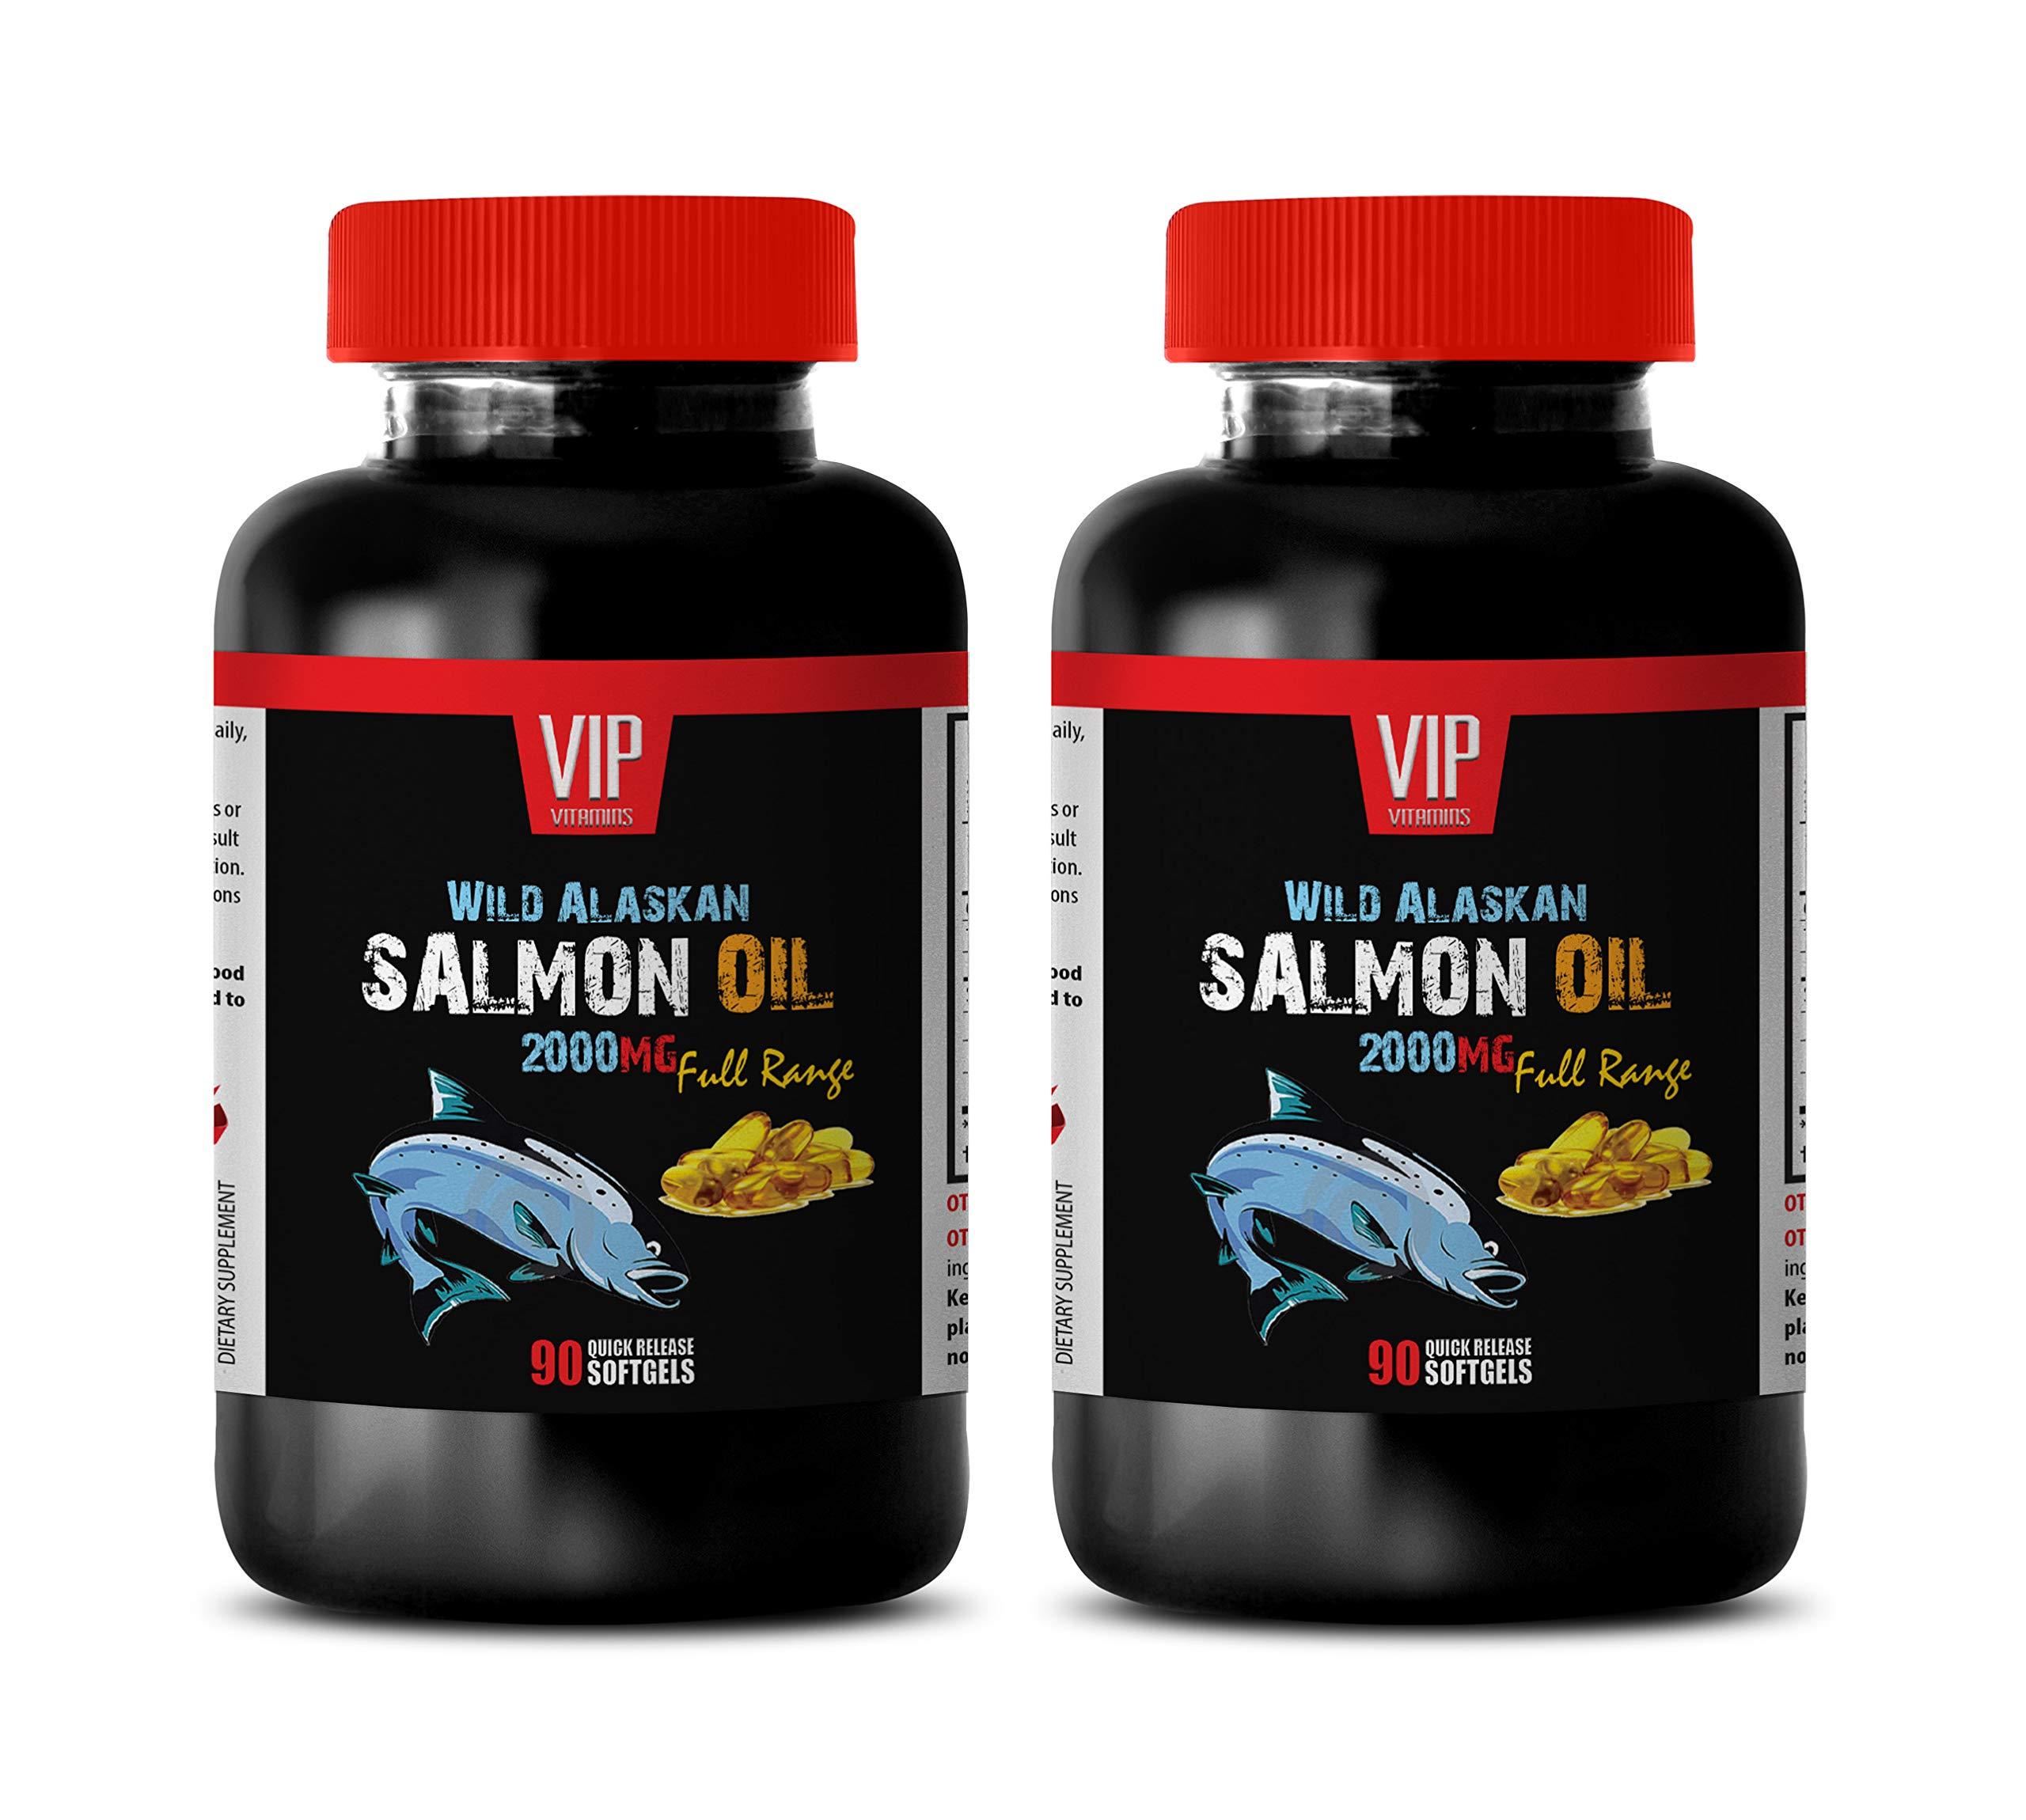 Cholesterol lowering Products - Wild Alaskan Salmon Oil 2000 - Fish Oil Omega 3 for Women - 2 Bottles 180 Softgels